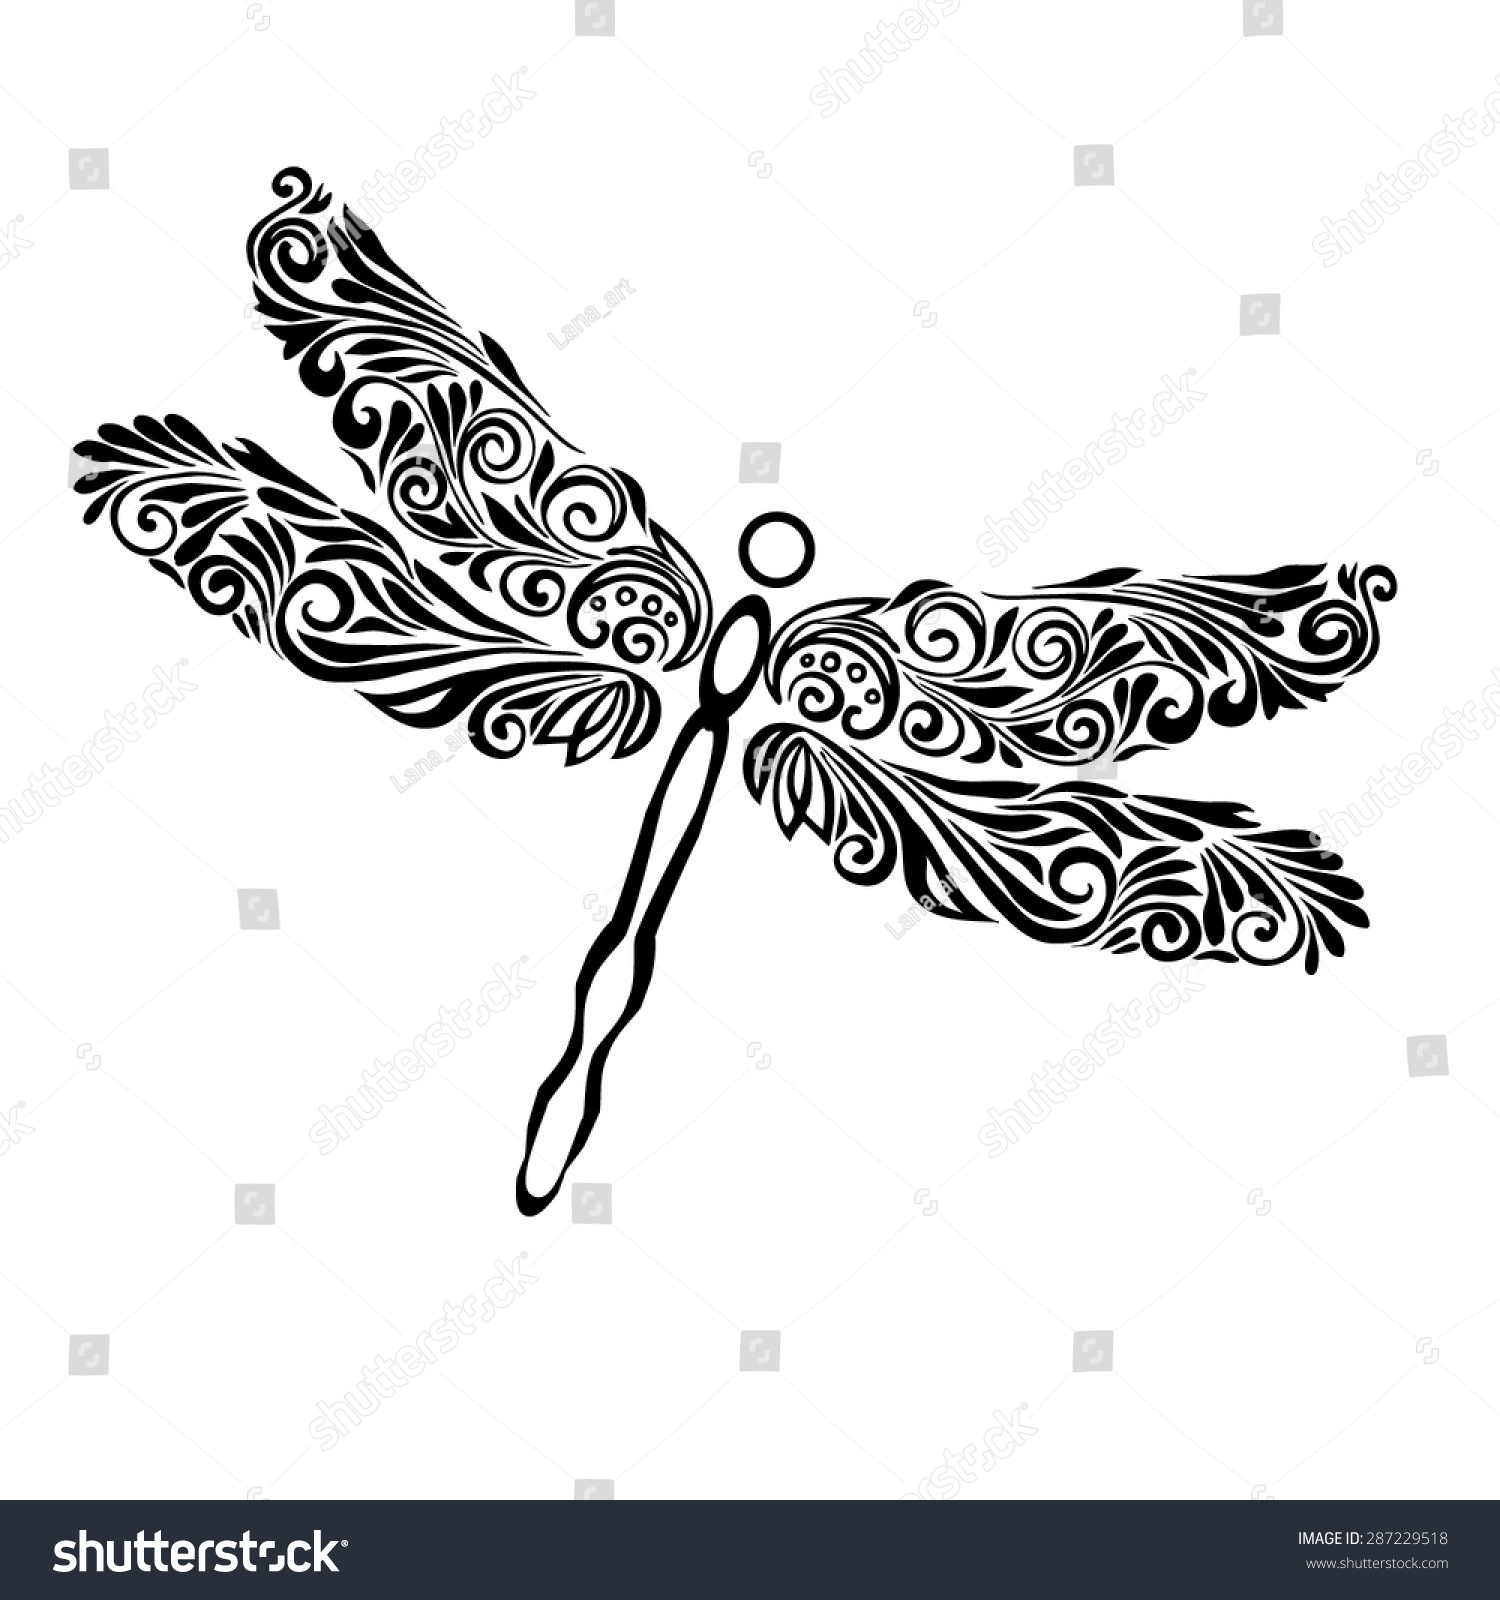 Dragonfly A Symbol Femininity Patterned Stylized Image Dragonfly